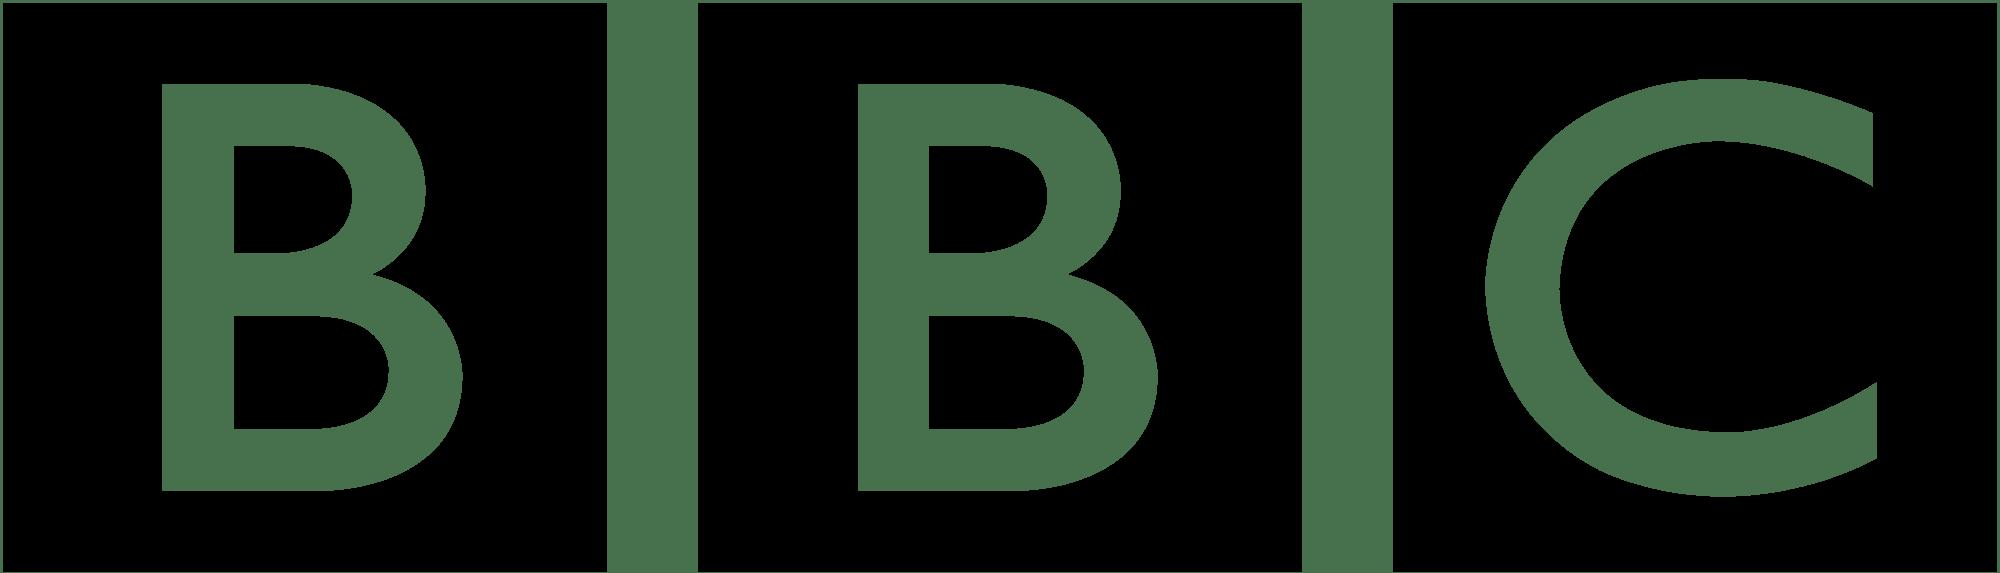 Bbc black n white